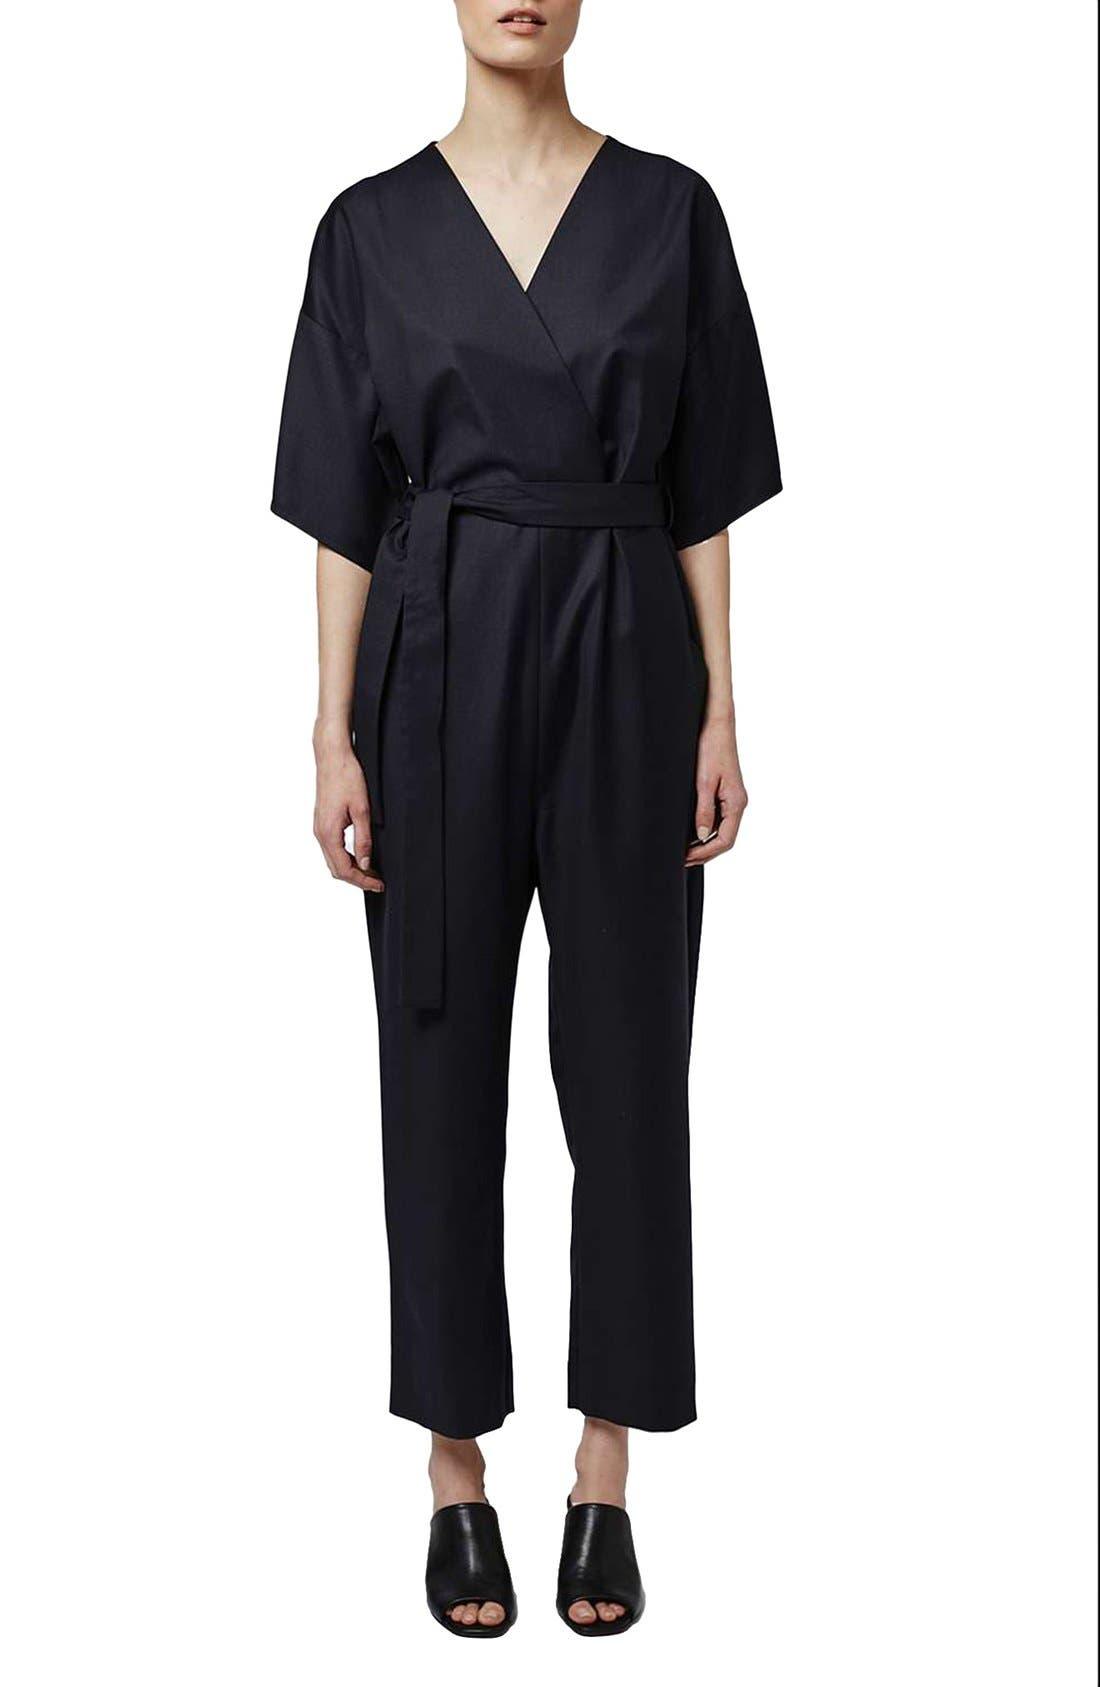 Alternate Image 1 Selected - Topshop Boutique Wool Kimono Wrap Jumpsuit